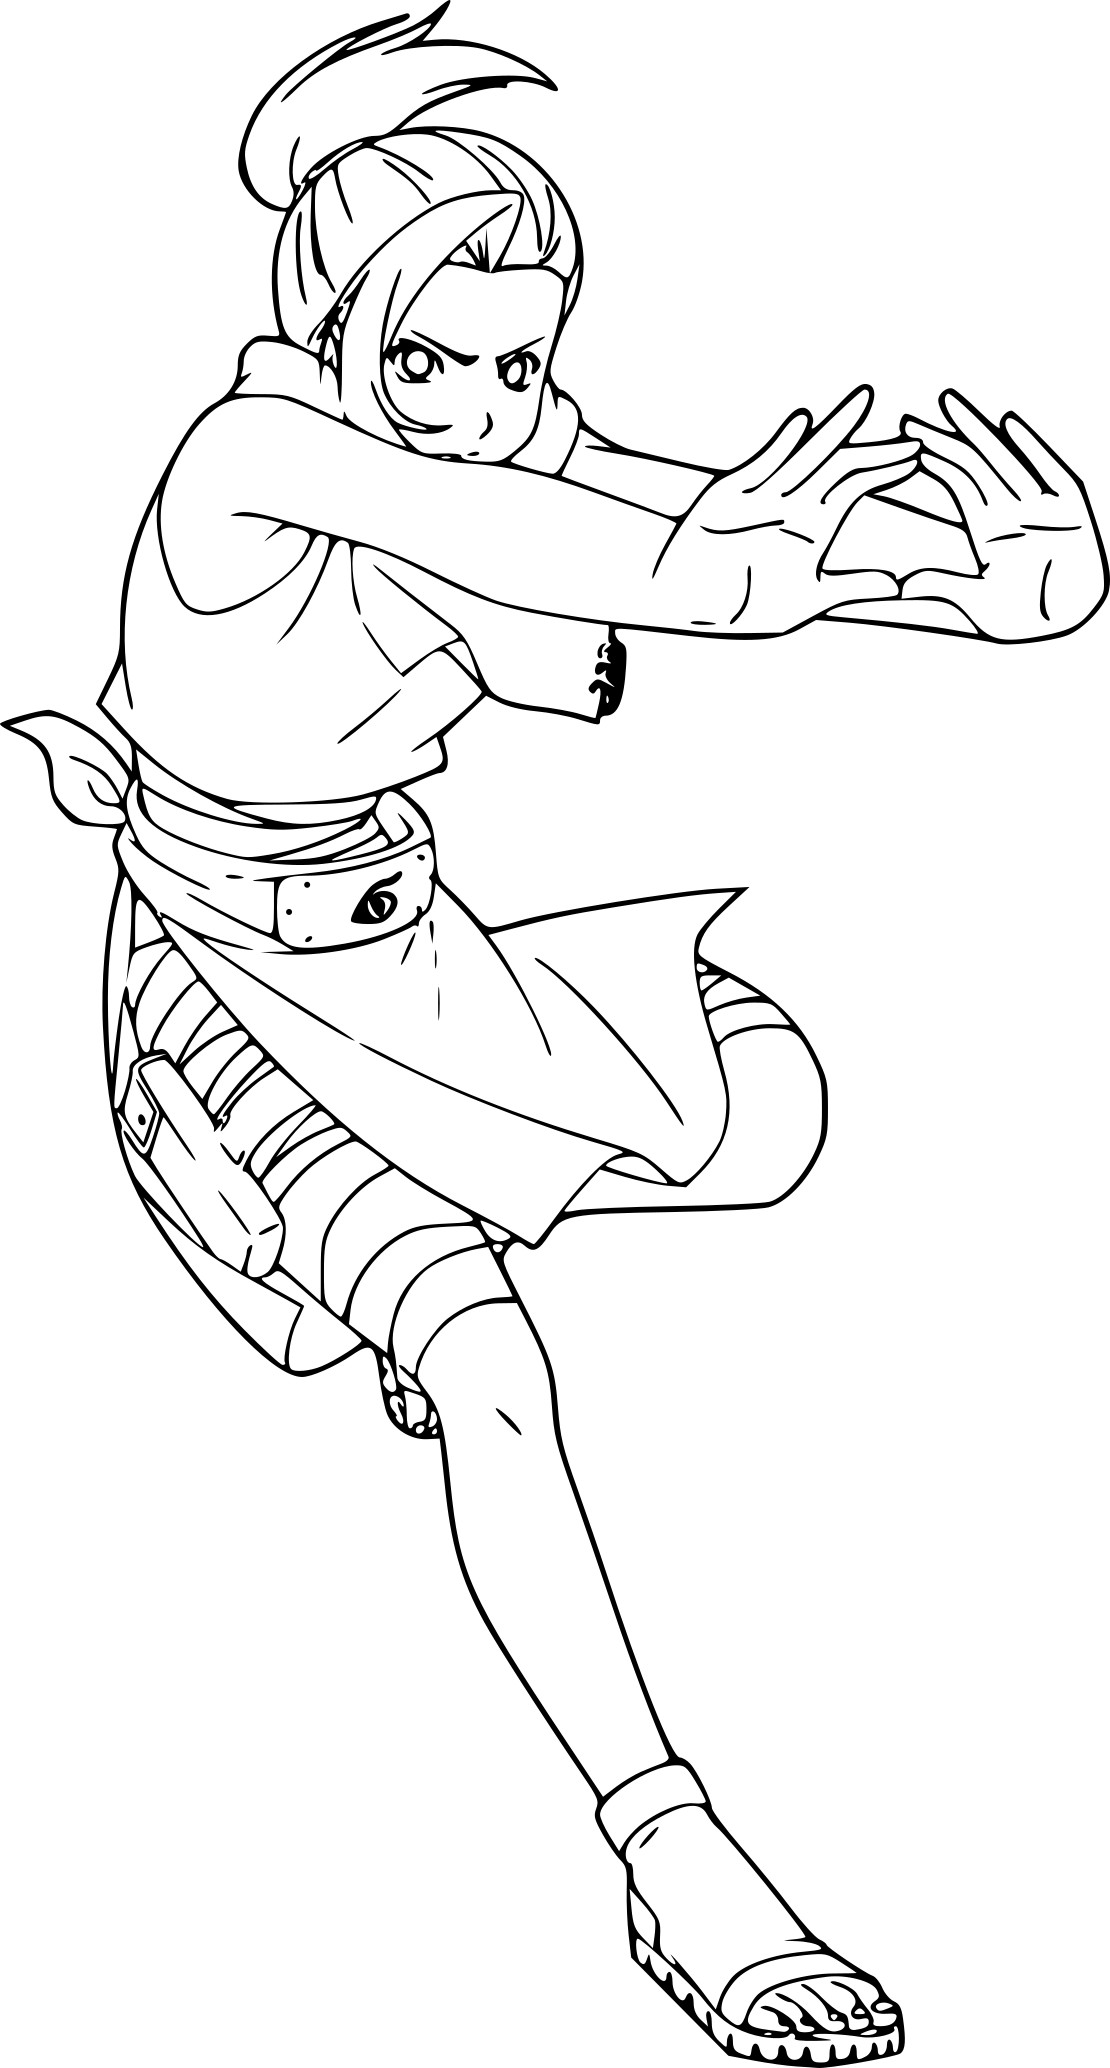 Coloriage Naruto fille à imprimer